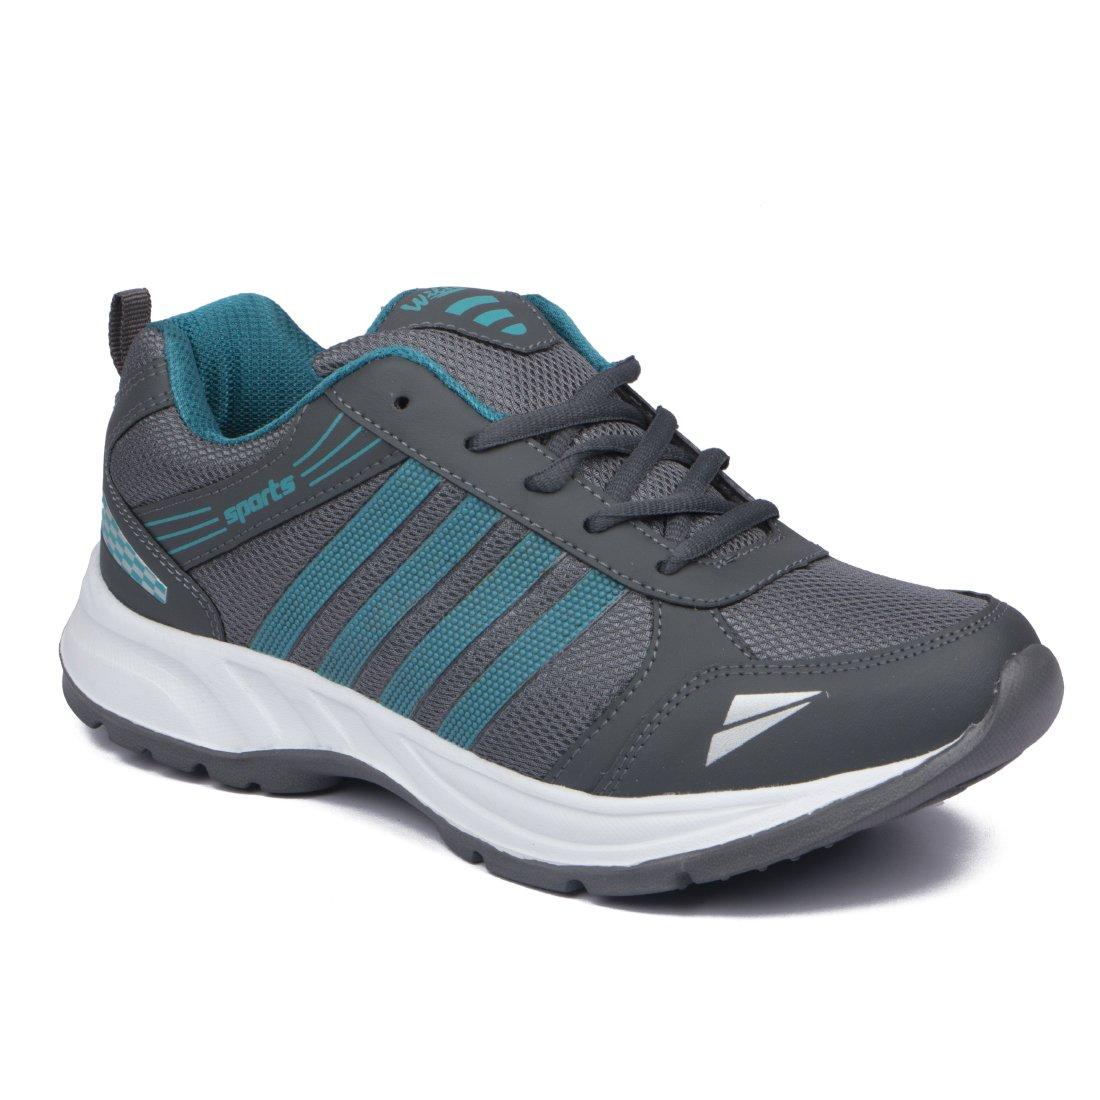 ASIAN Shoes Wonder-13 Grey Firozi Mesh Shoes product image